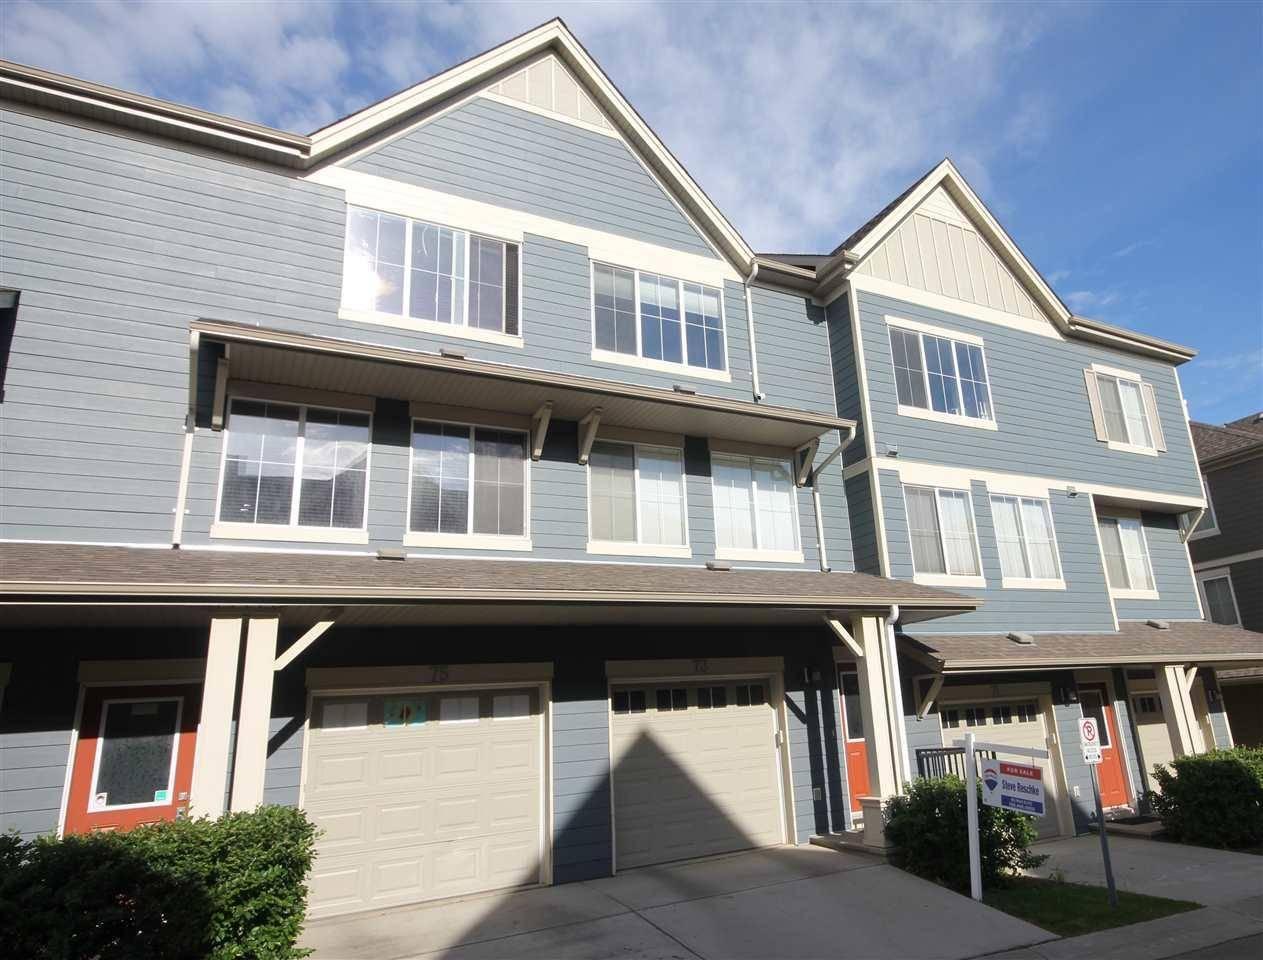 Townhouse for sale at 603 Watt Blvd Sw Unit 73 Edmonton Alberta - MLS: E4159843